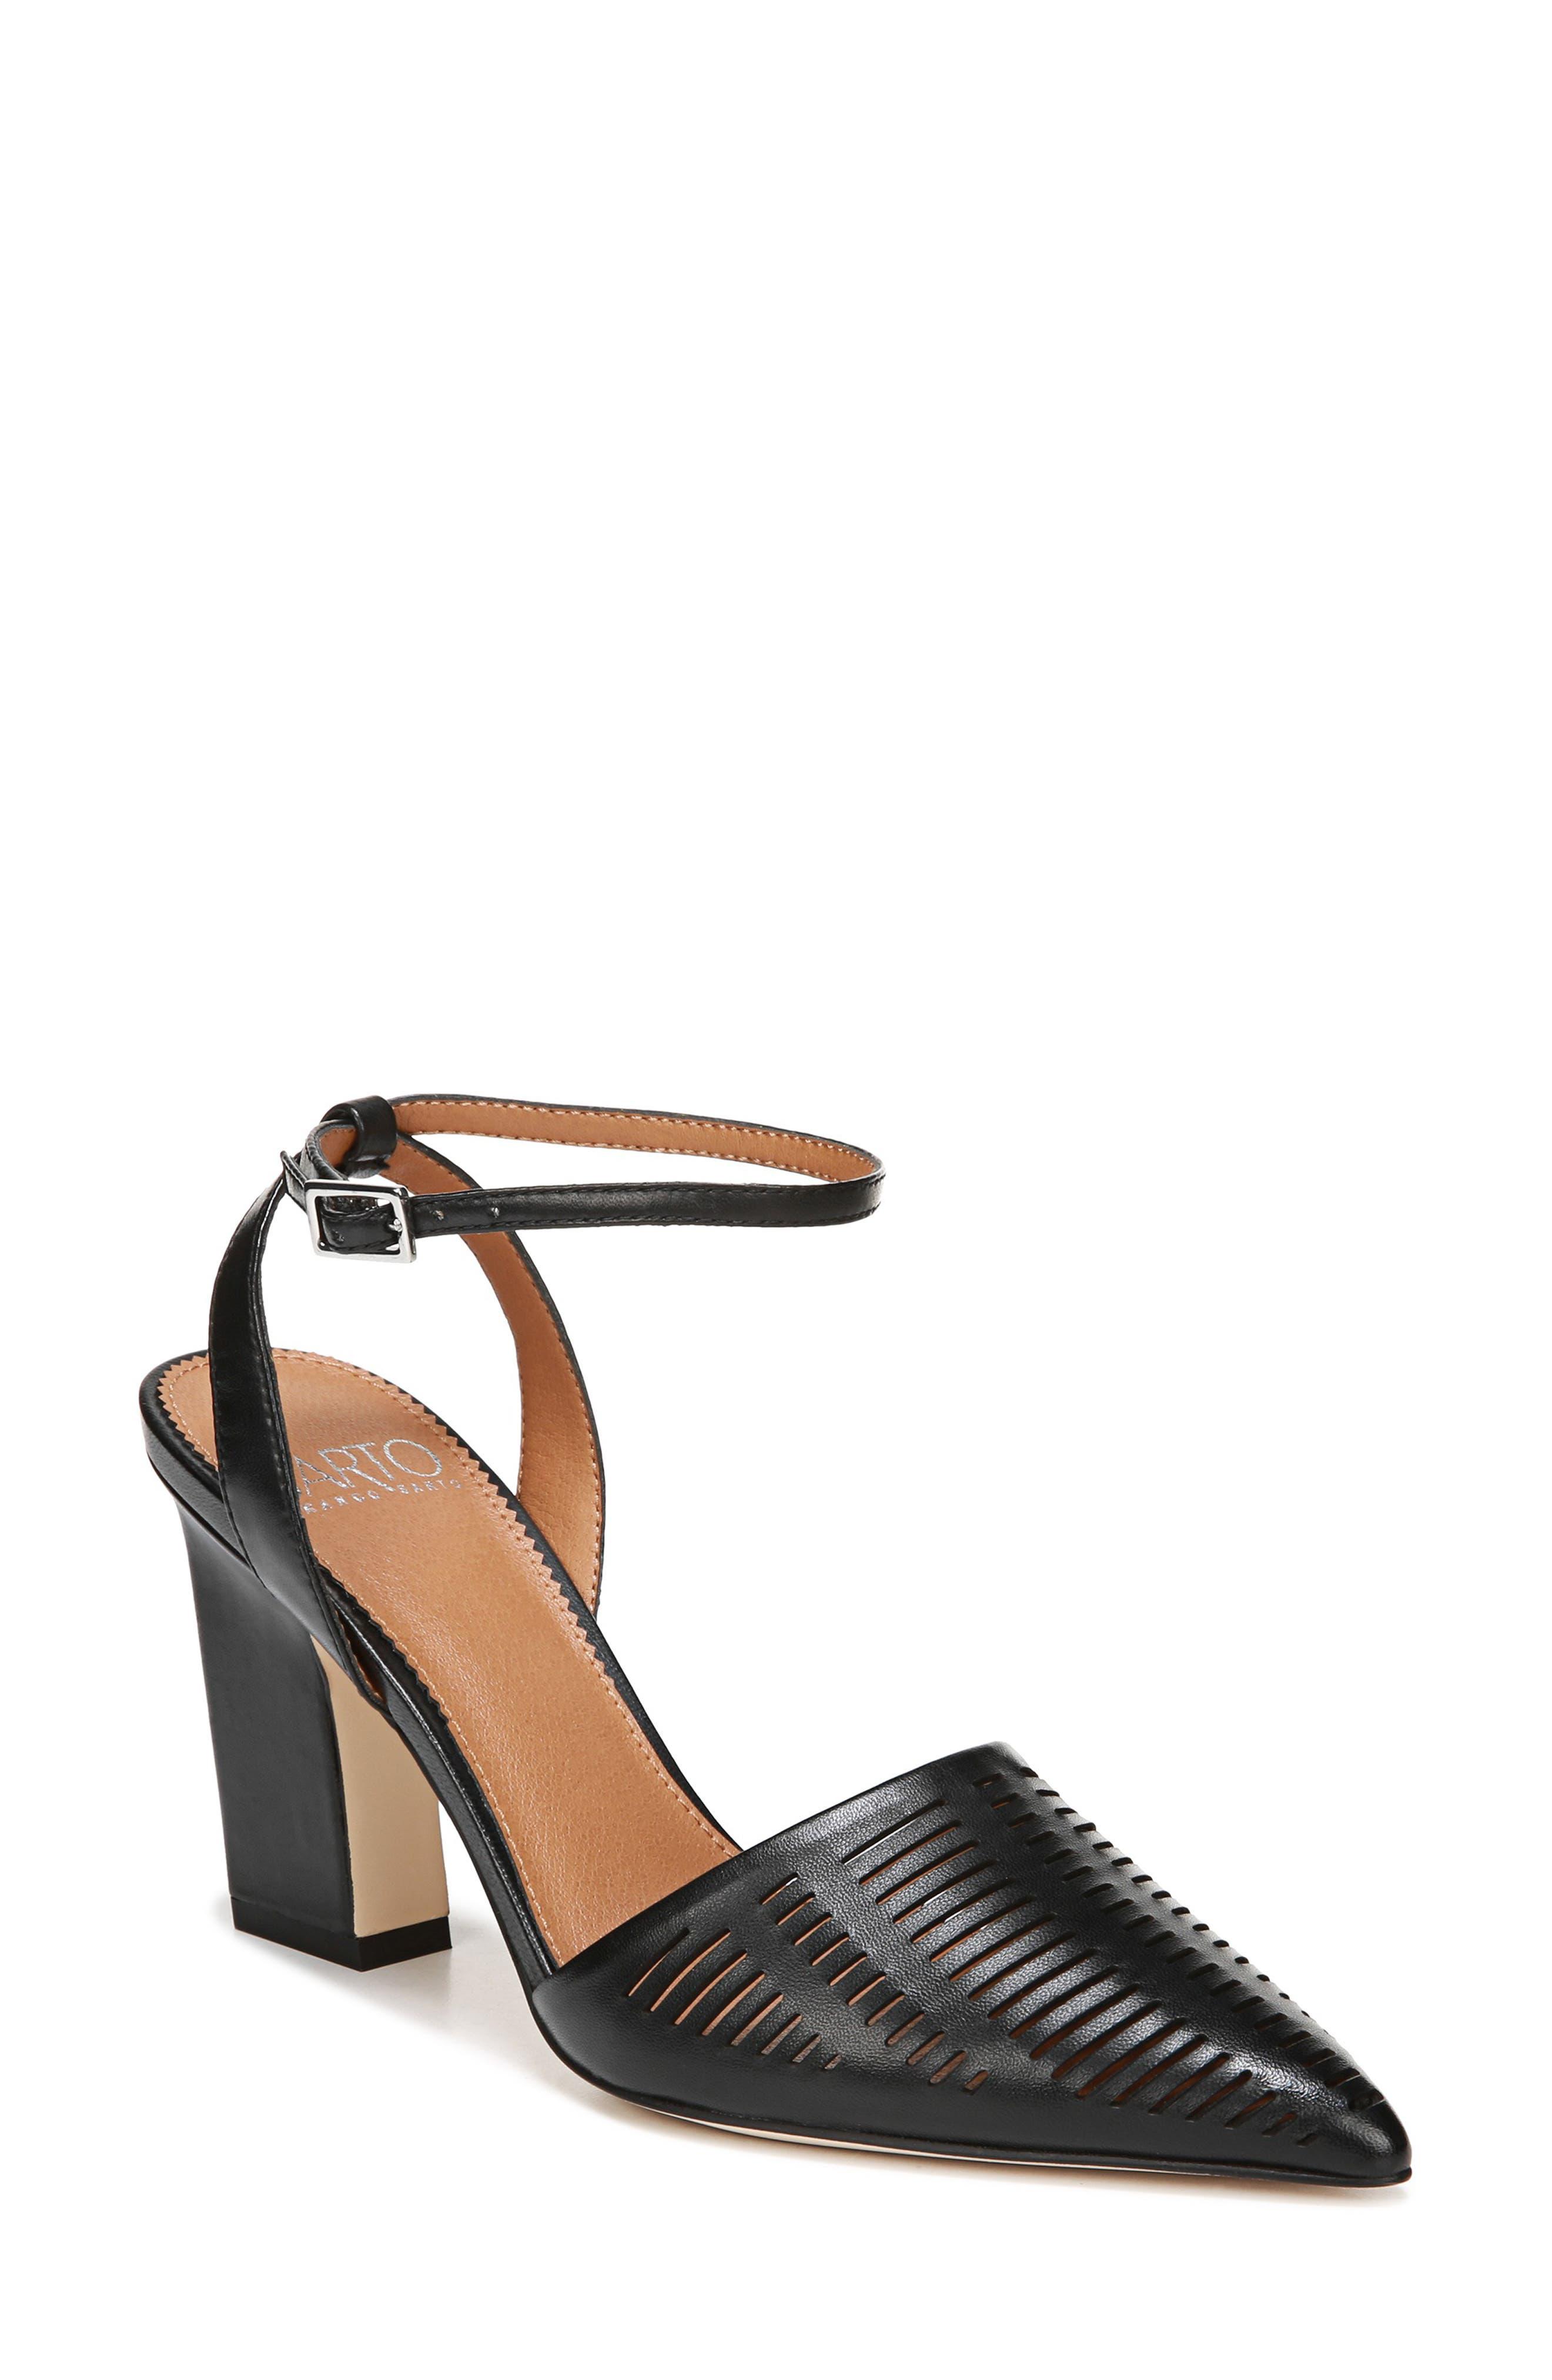 Sarto By Franco Sarto Starla Ankle Strap Pump- Black